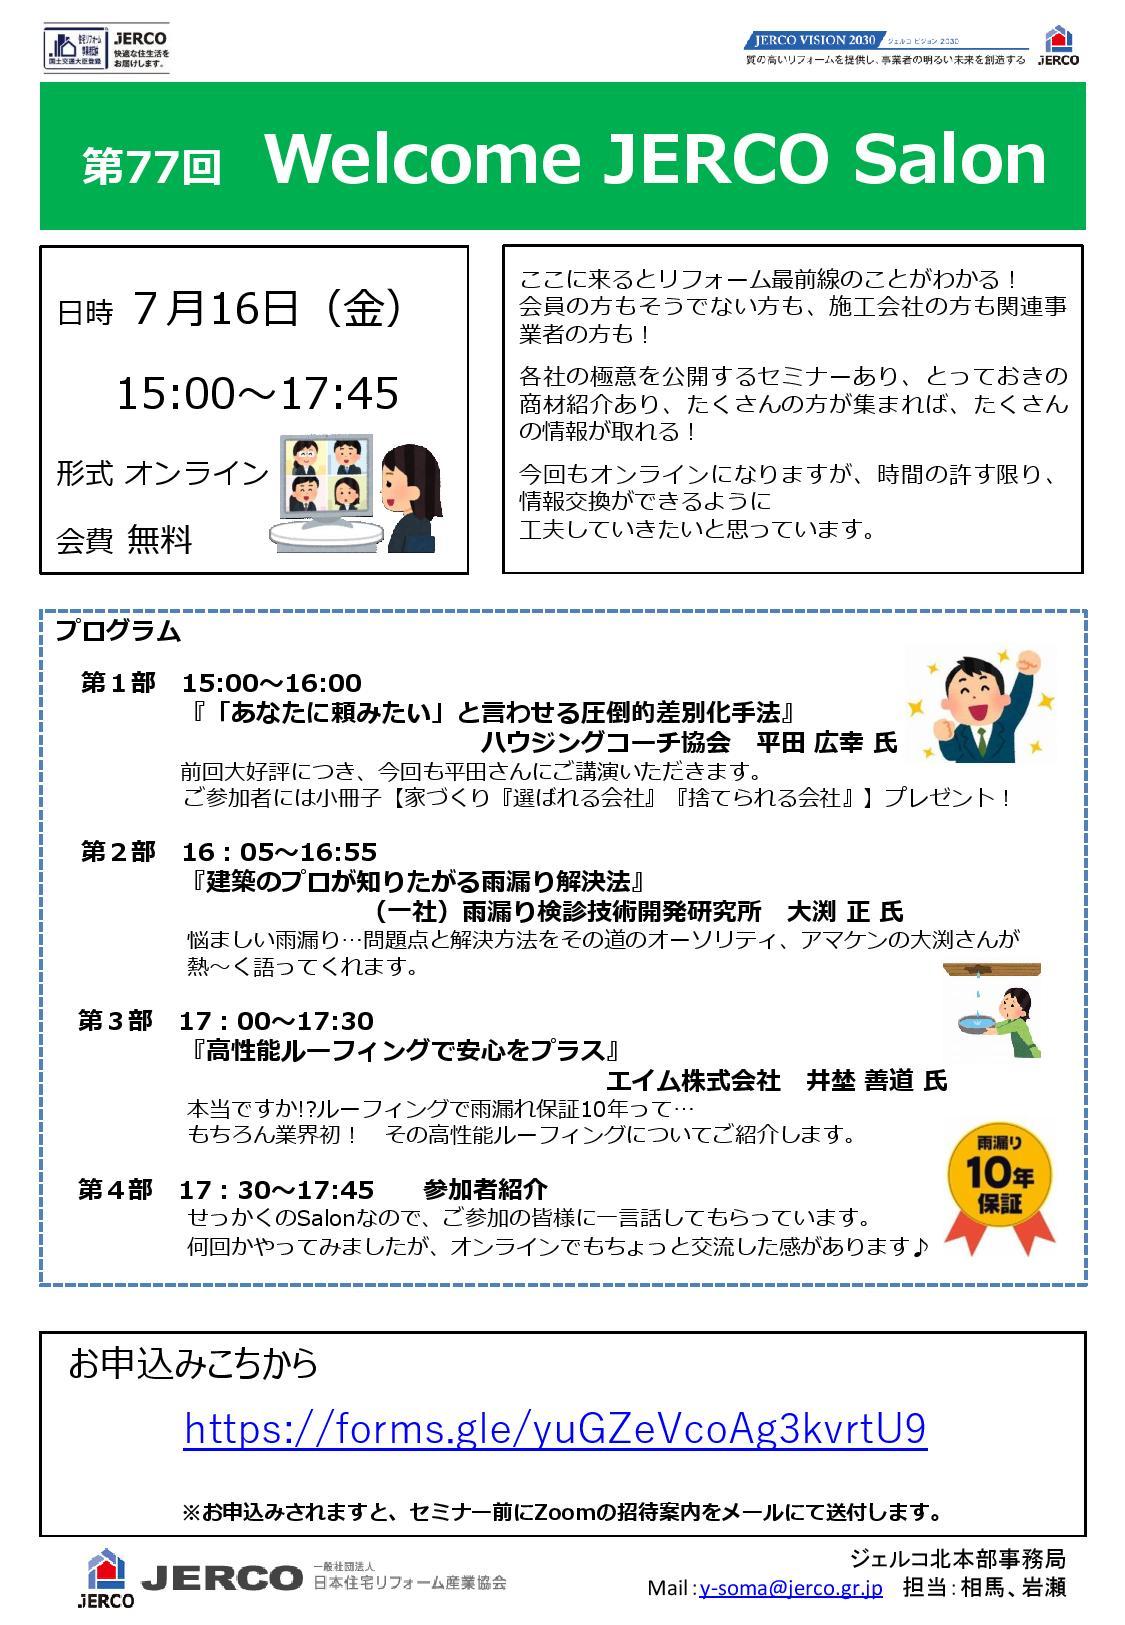 2021年7月16日(金)15:00~ Welcome JERCO Salon